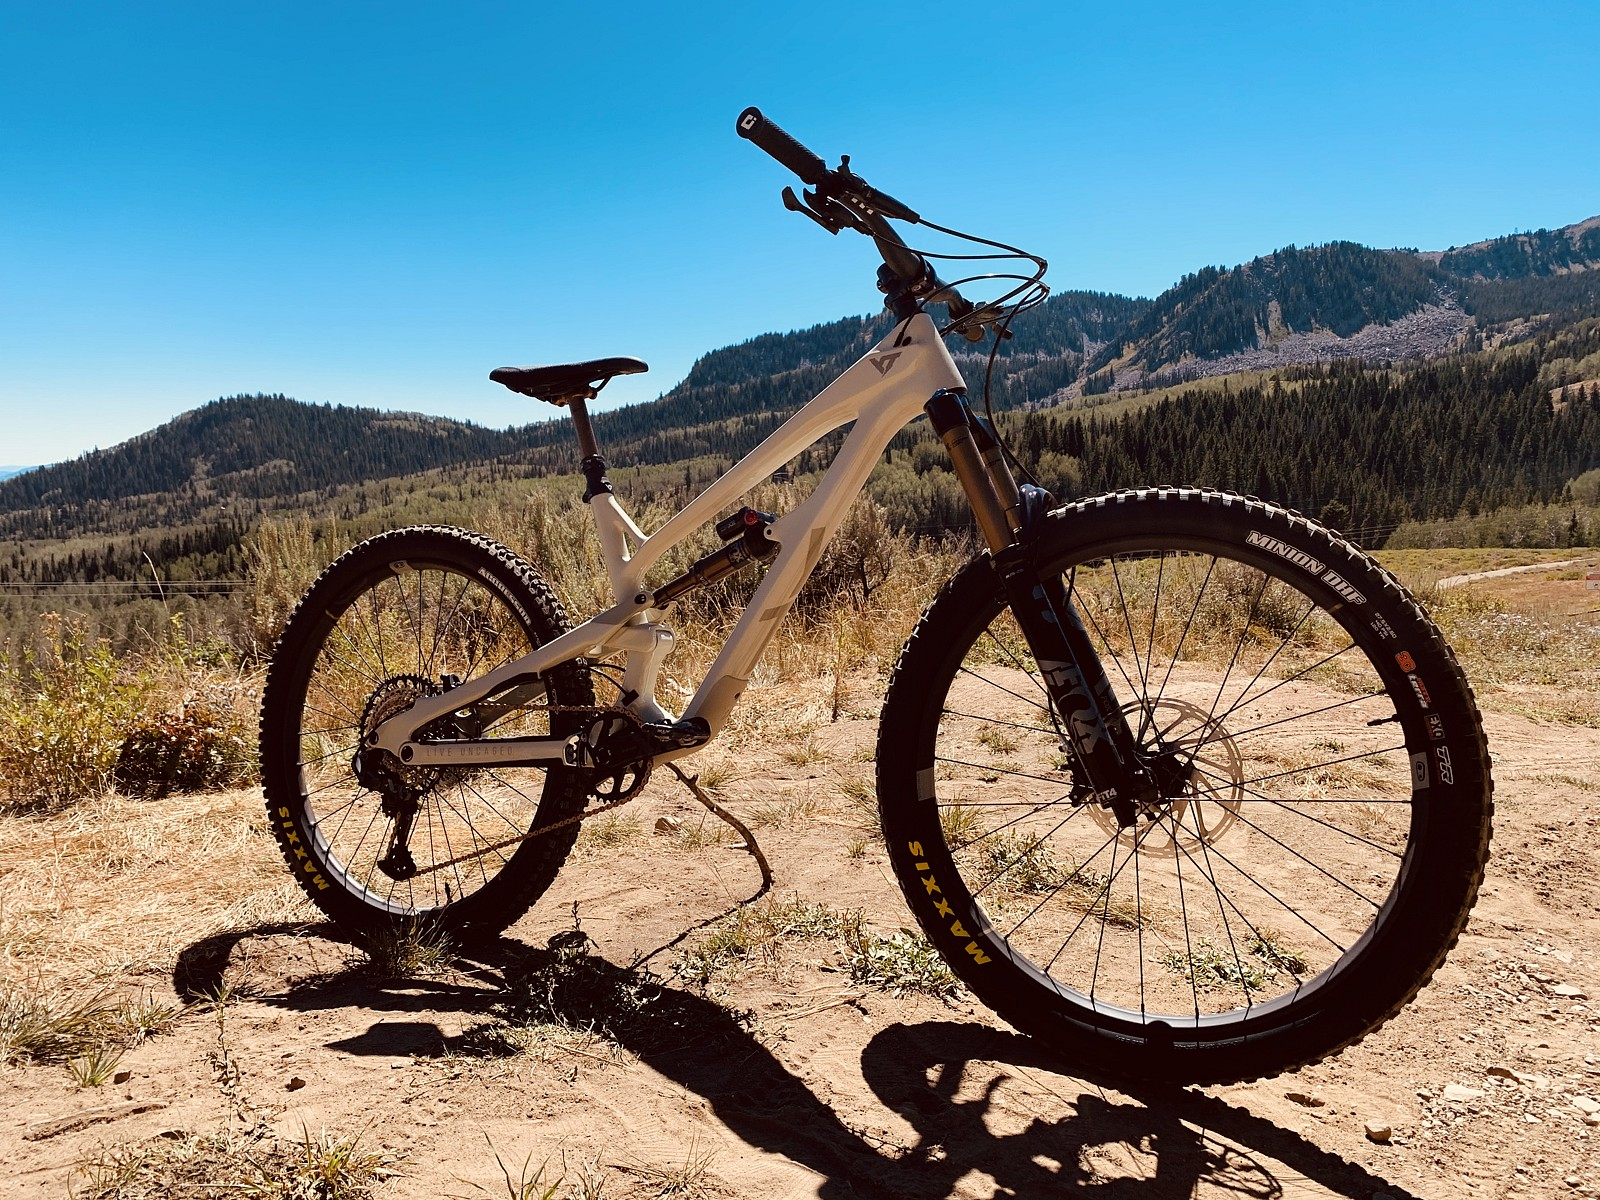 IMG E0209 - jaykalafatis - Mountain Biking Pictures - Vital MTB